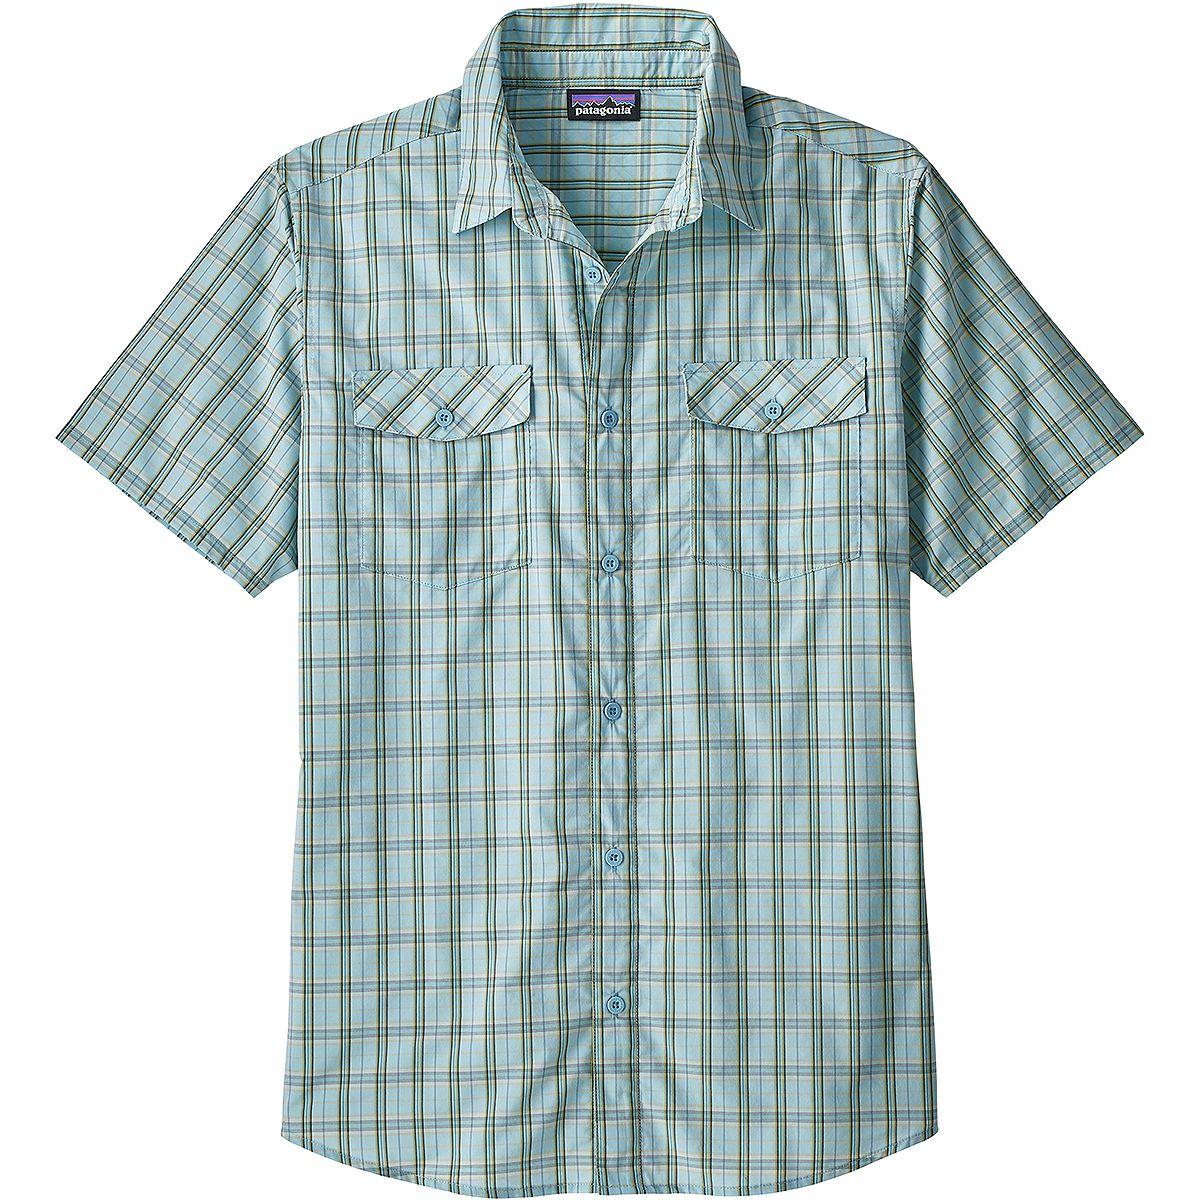 Patagonia High Moss Shirt